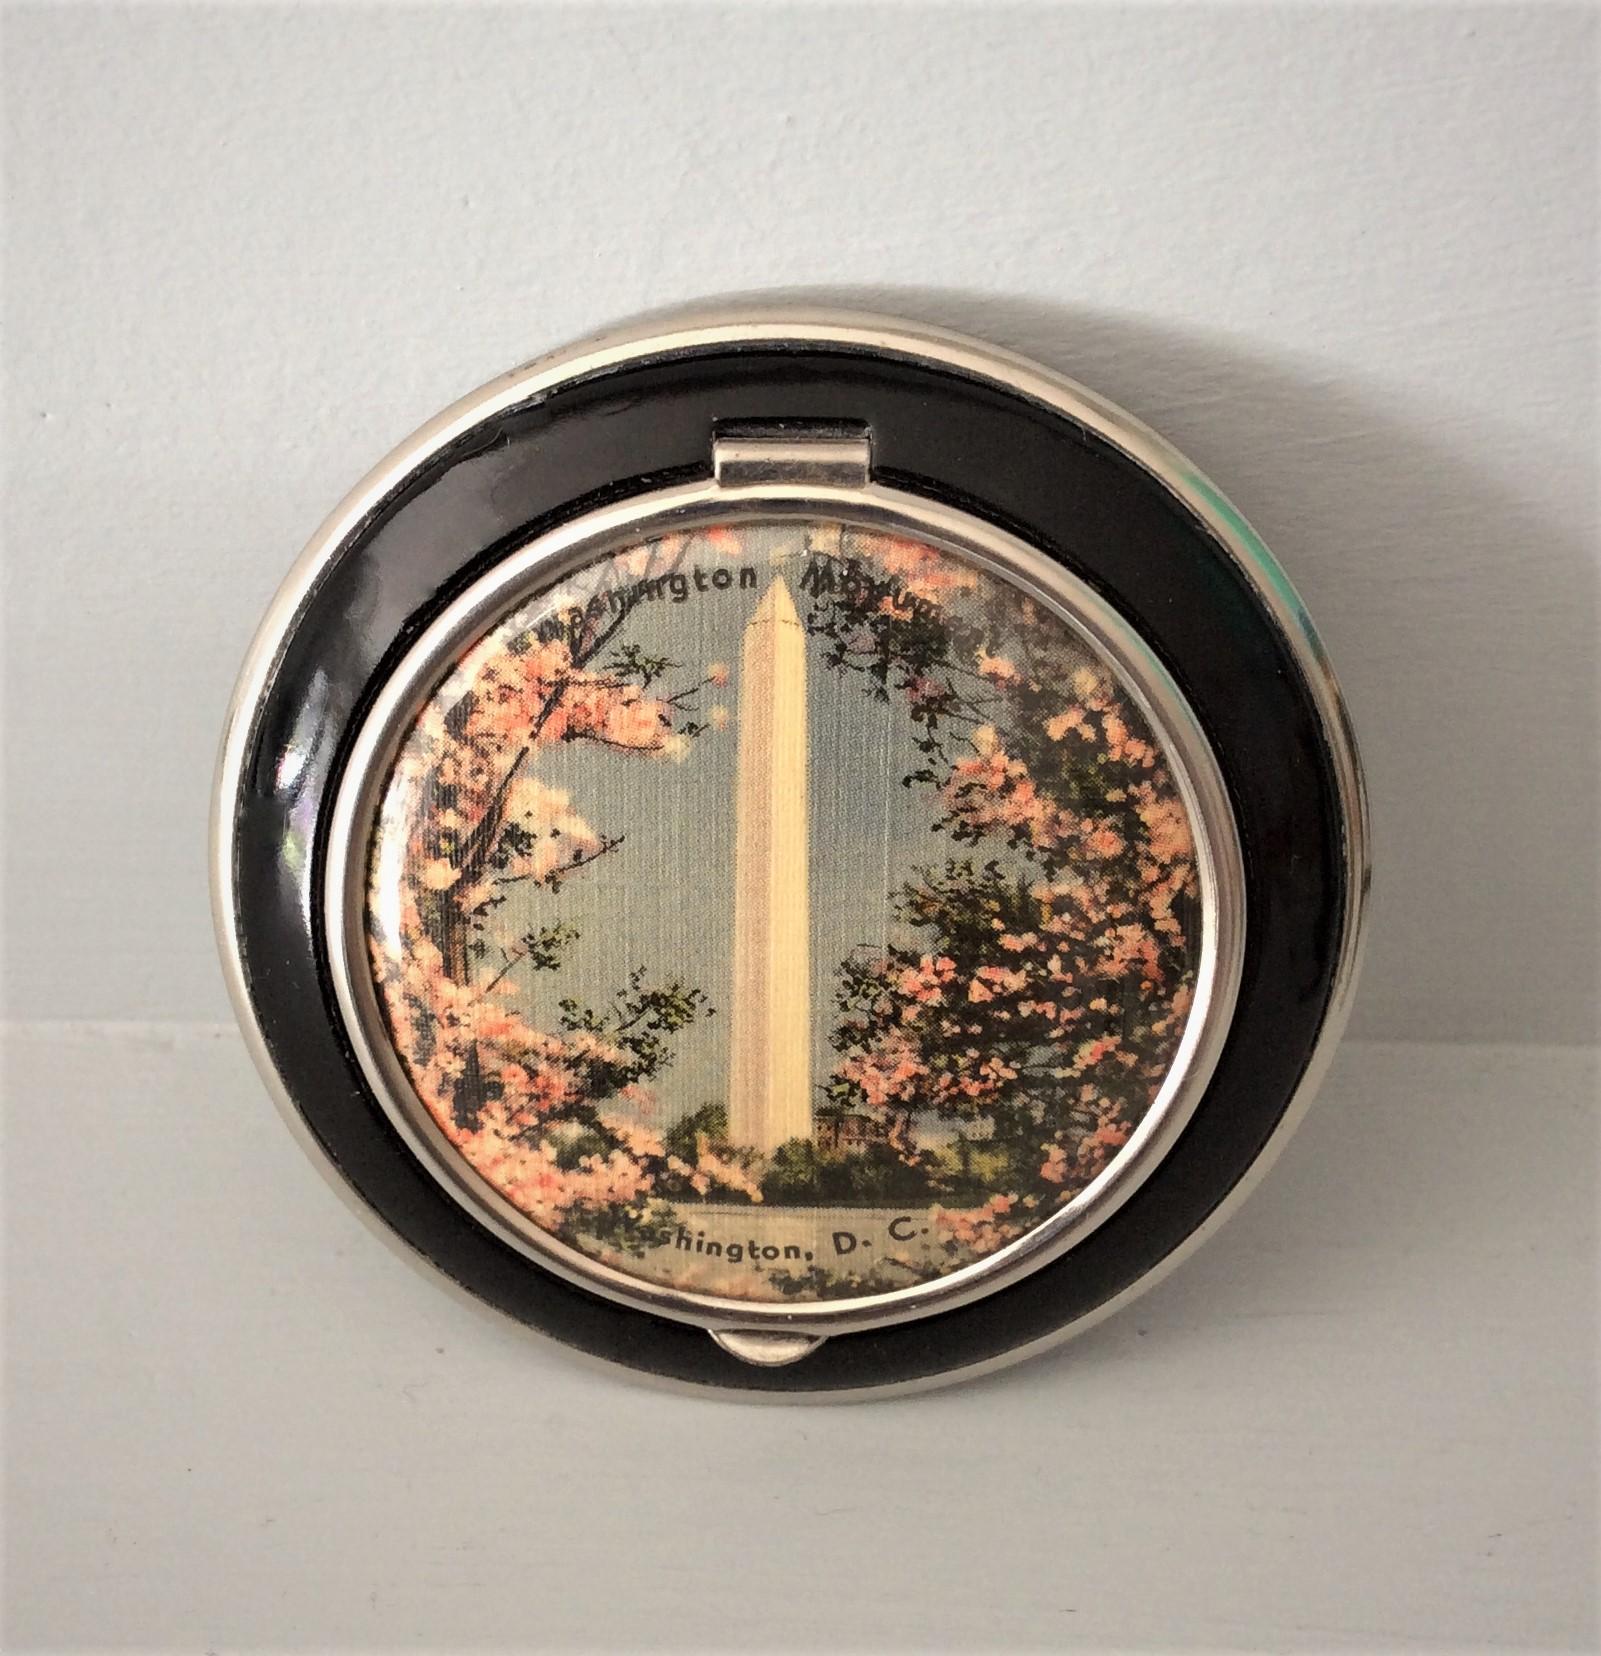 Vintage Collectable 30s Black Enamel Loose Powder Washington DC Monument Powder Compact